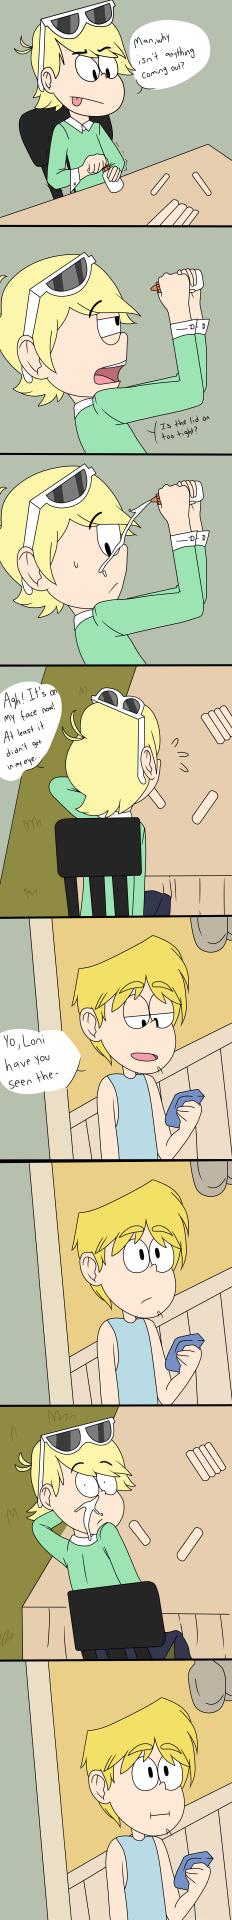 Loni Fail and Loki Loud - by MikikiMr